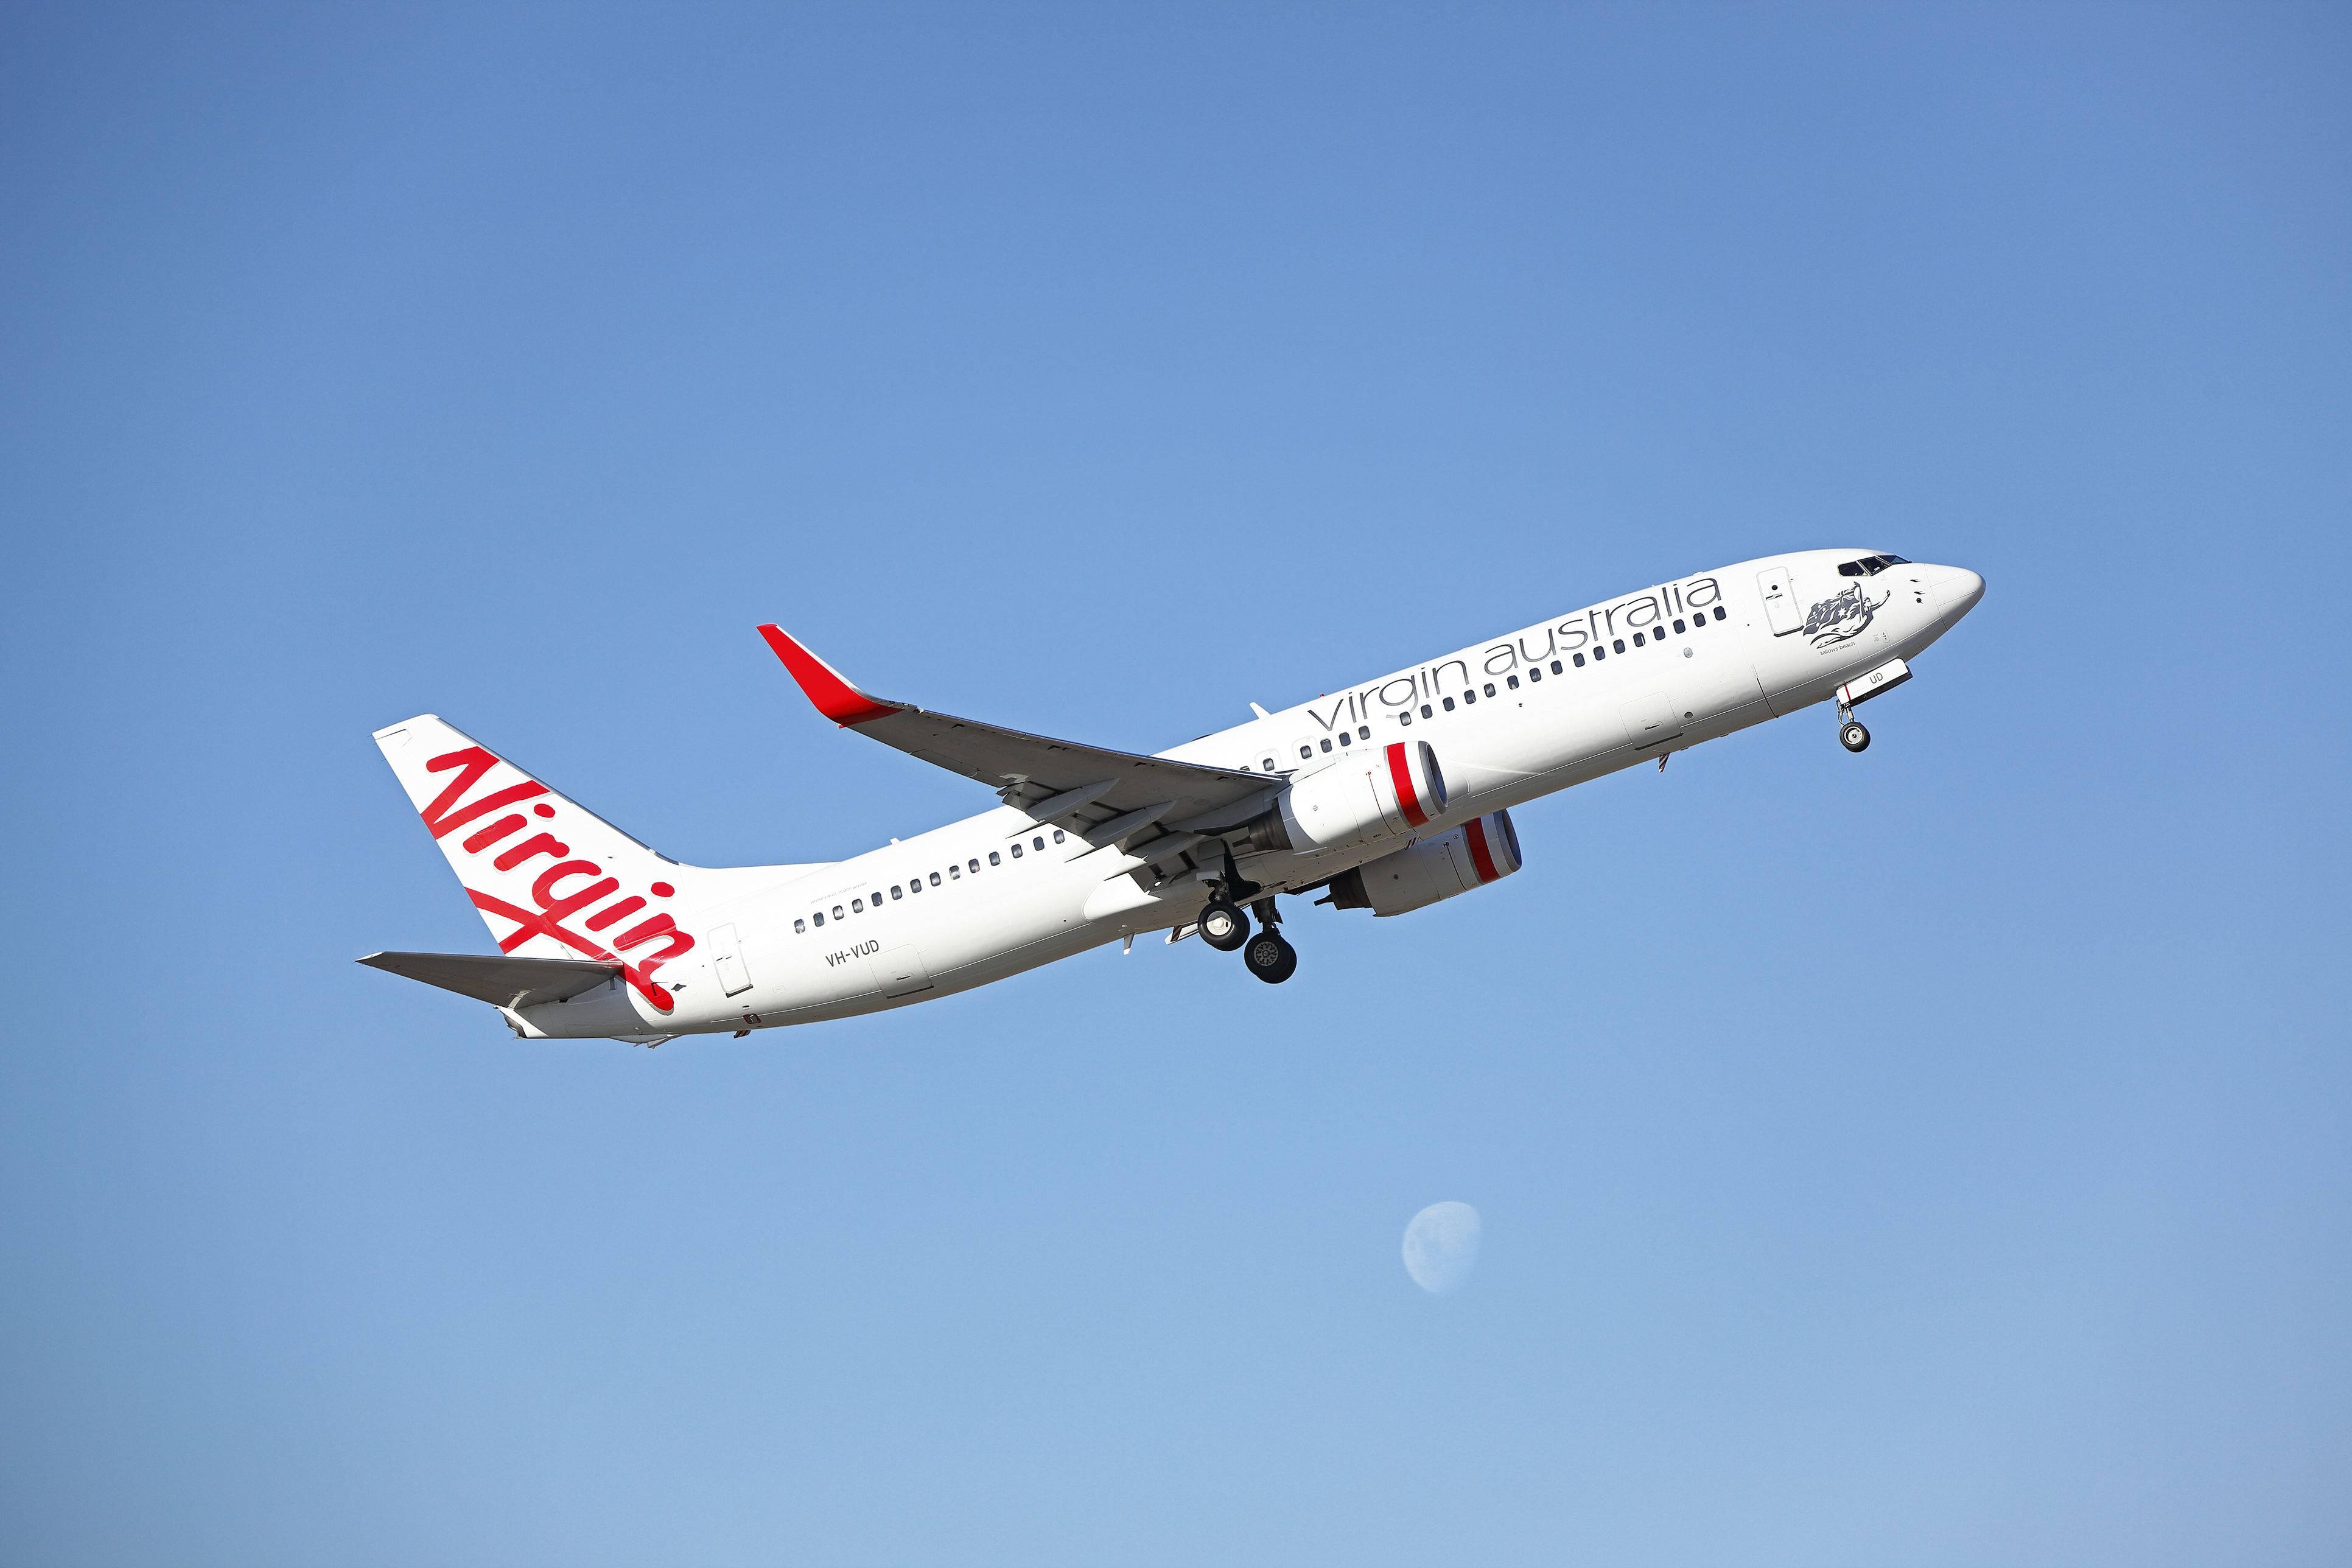 Virgin Australia targets more sustainable Hong Kong service in closer co-op with Virgin Atlantic